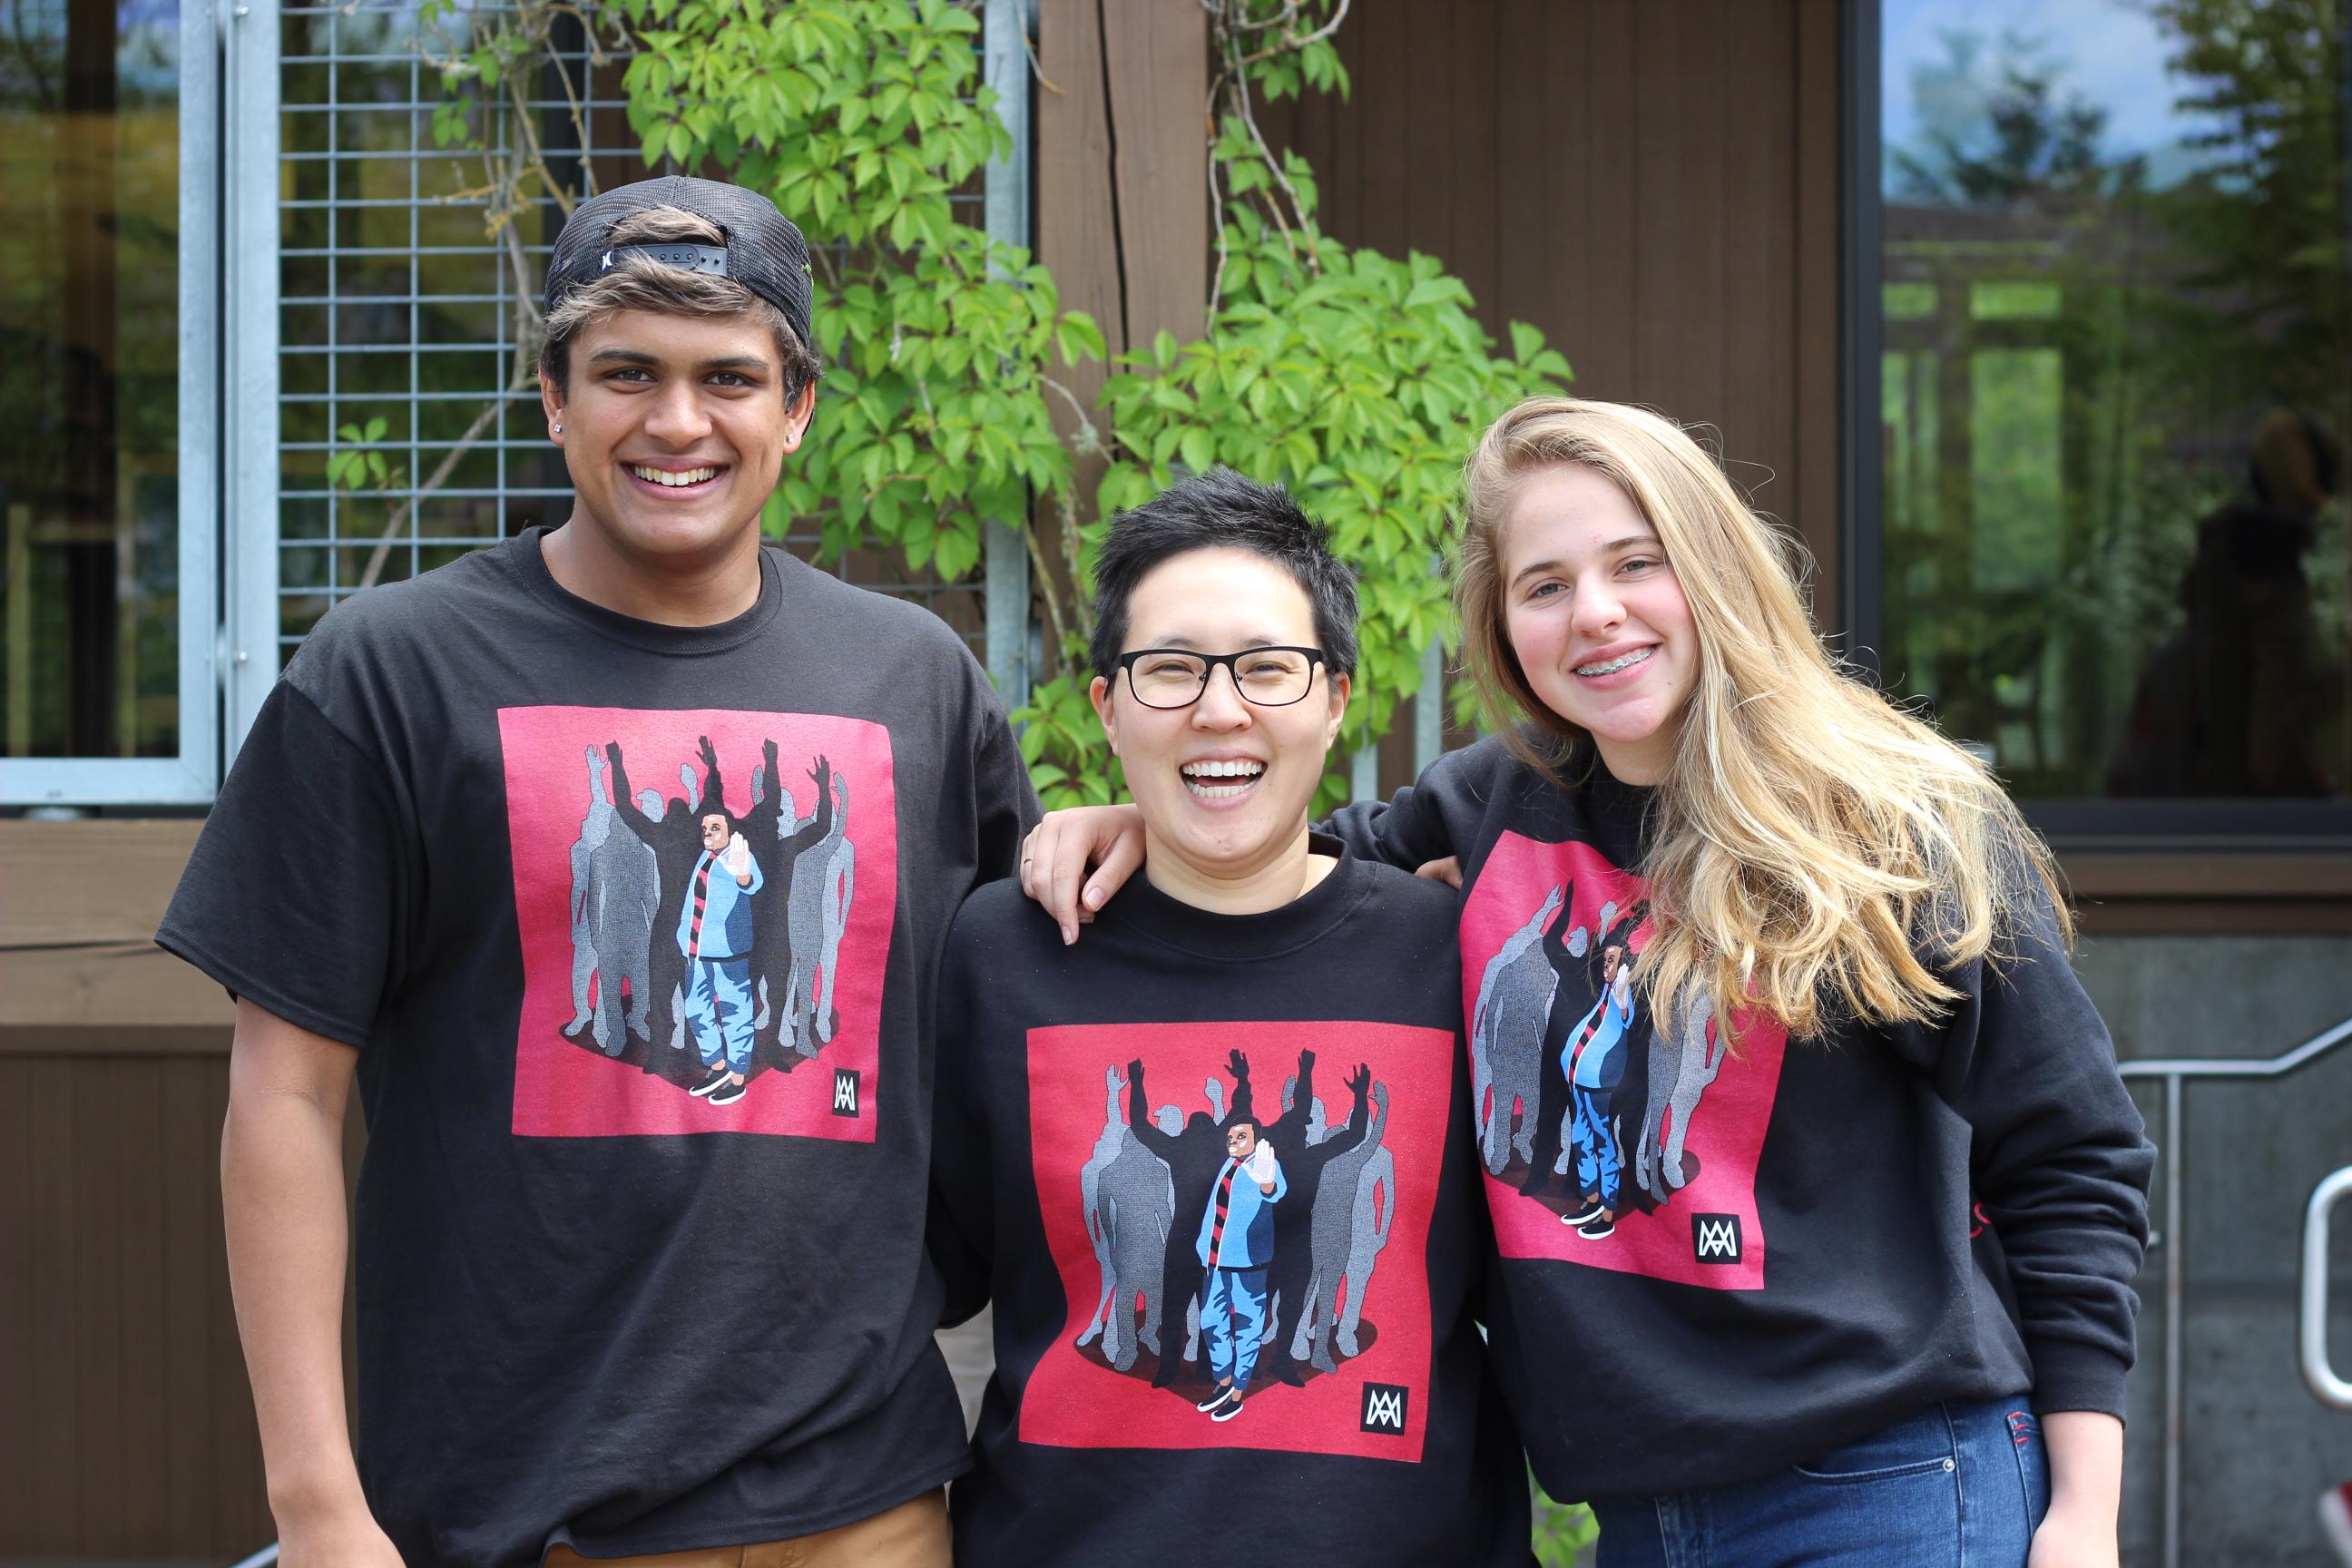 Custom T Shirts For Black Lives Matter In Portland Shirt Design Ideas